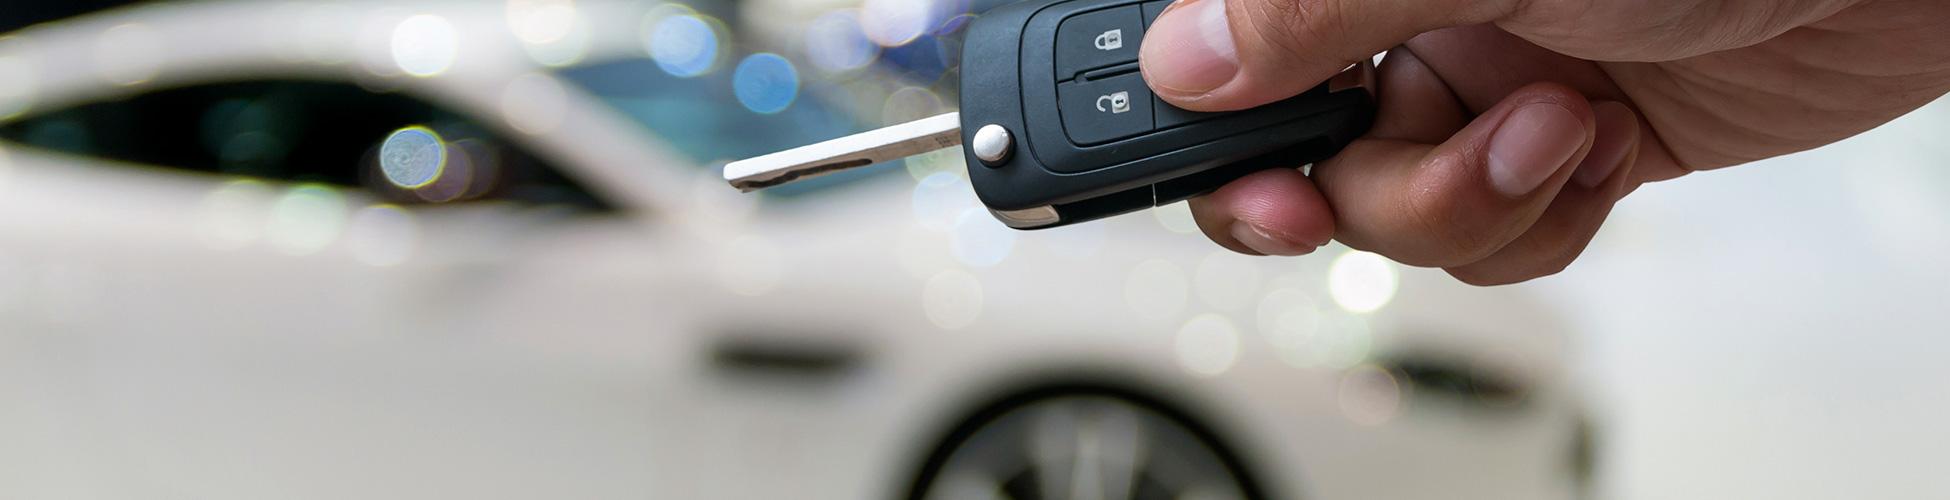 Vente/achat véhicule